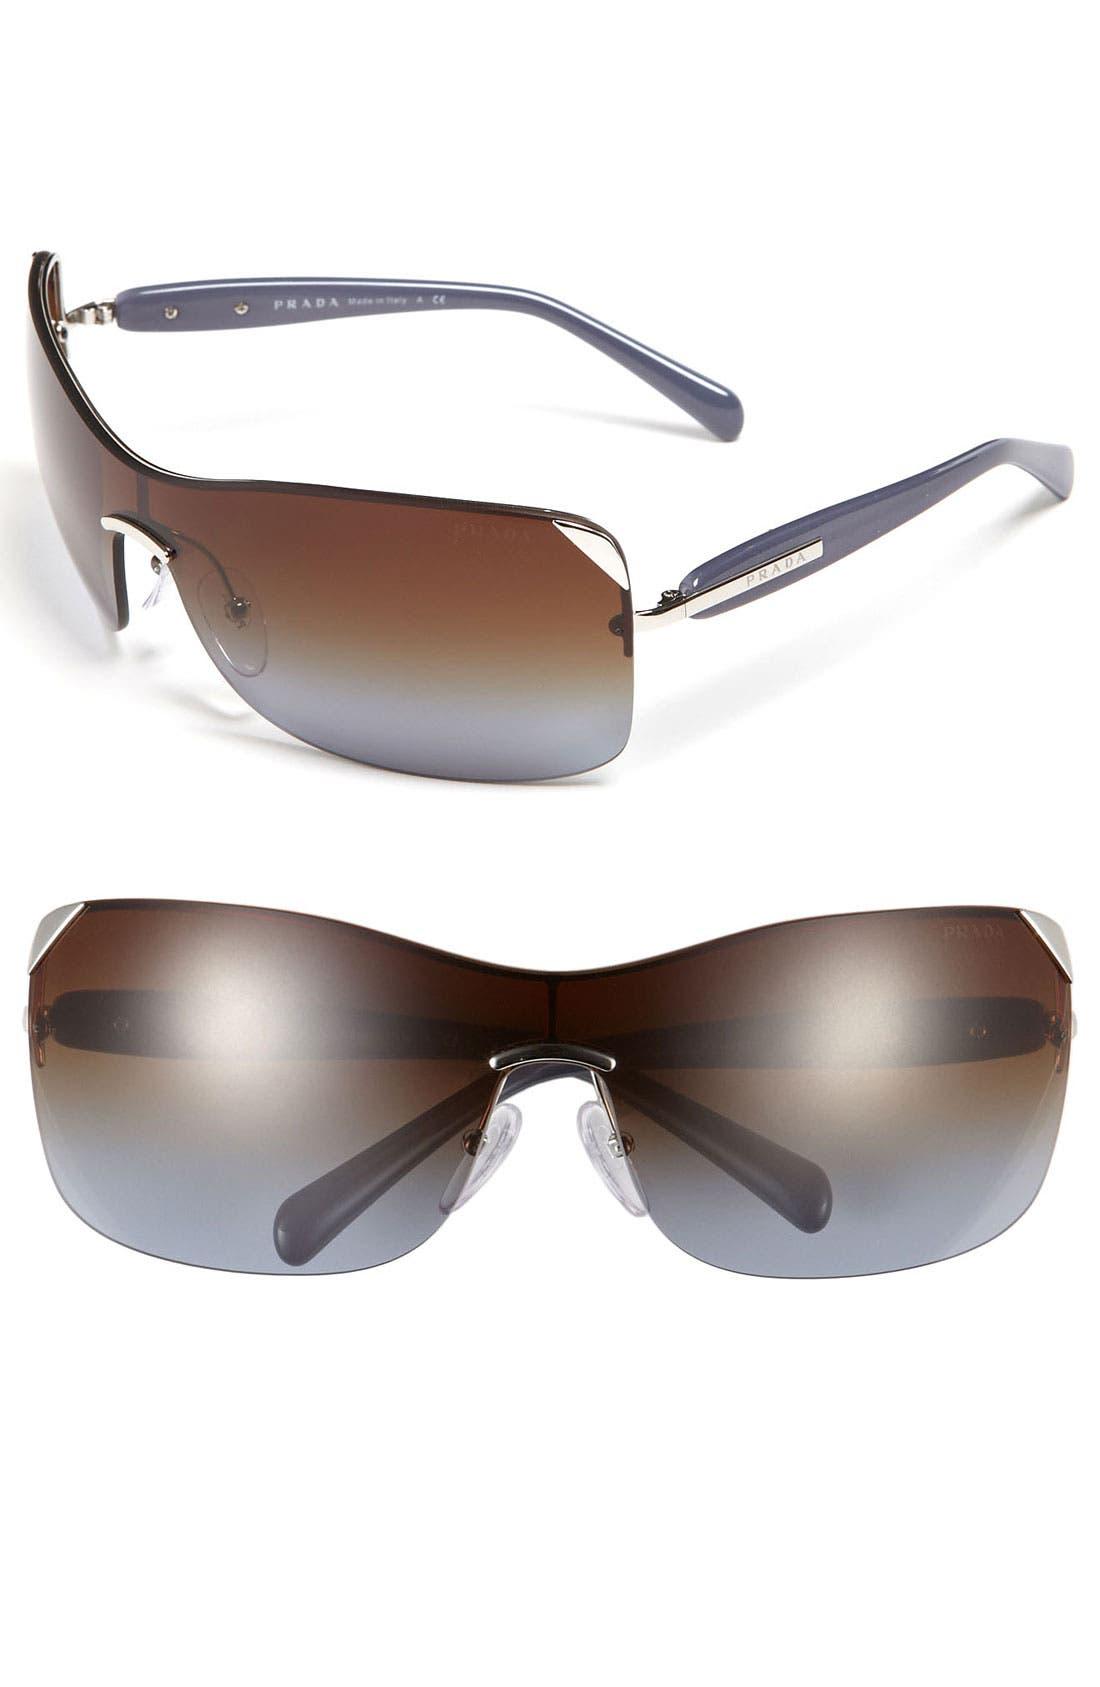 Main Image - Prada 63mm Shield Sunglasses